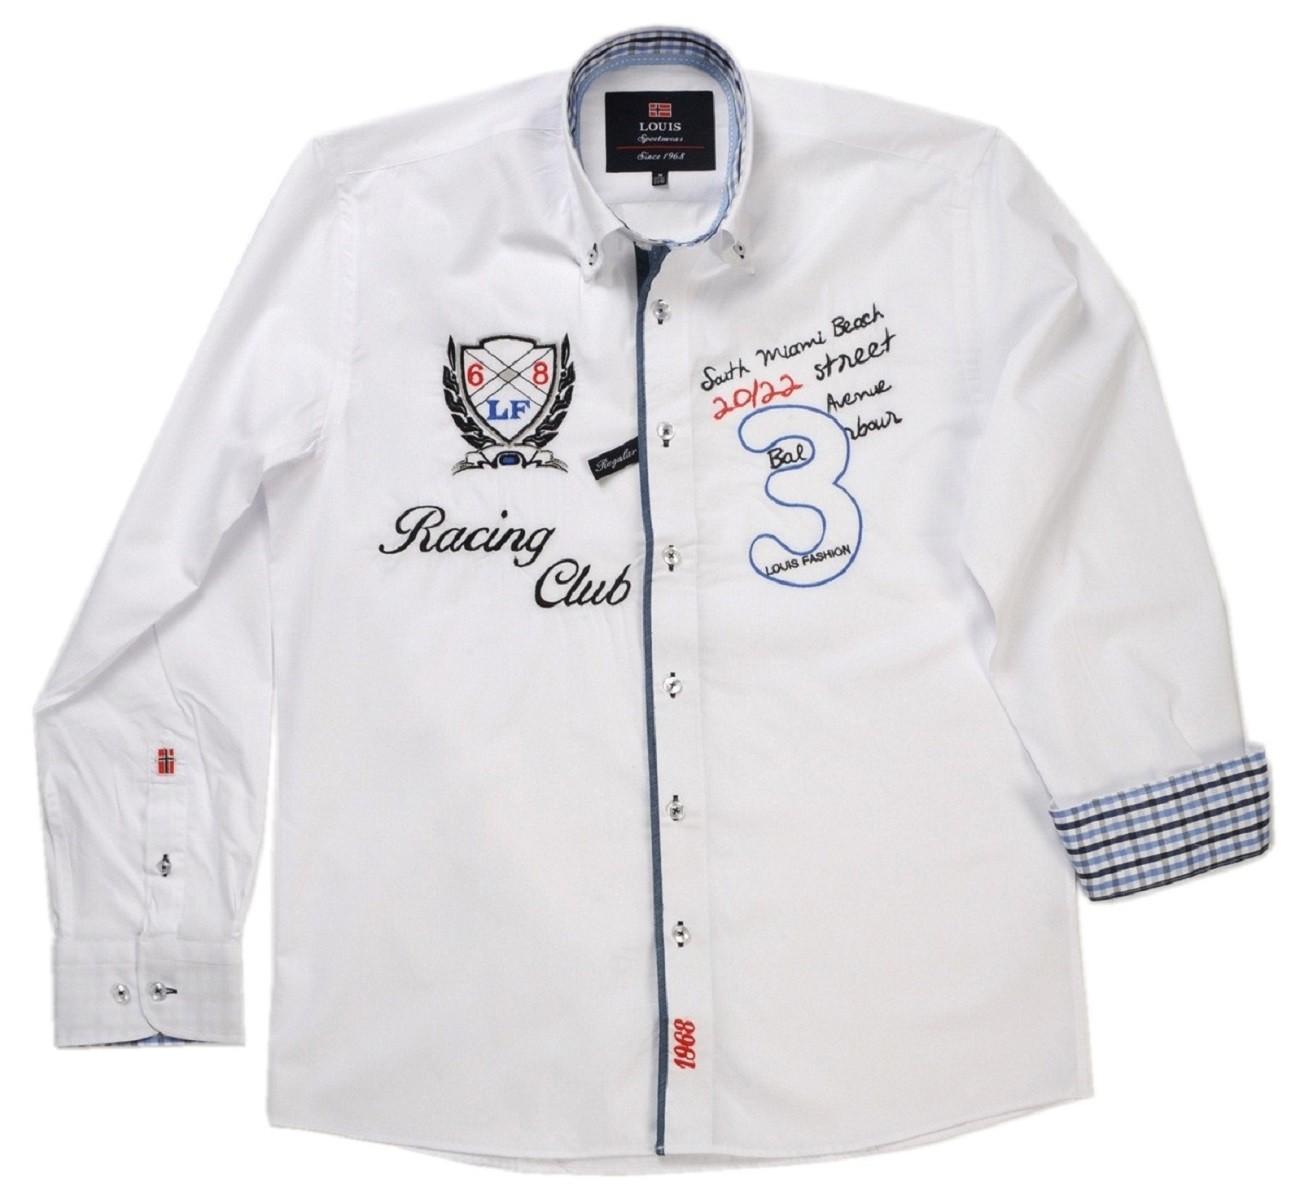 new arrivals 52947 4c6a8 Tobeni Herren Marken Hemd mit Langarm Casual-Style in verschiedenen Farben